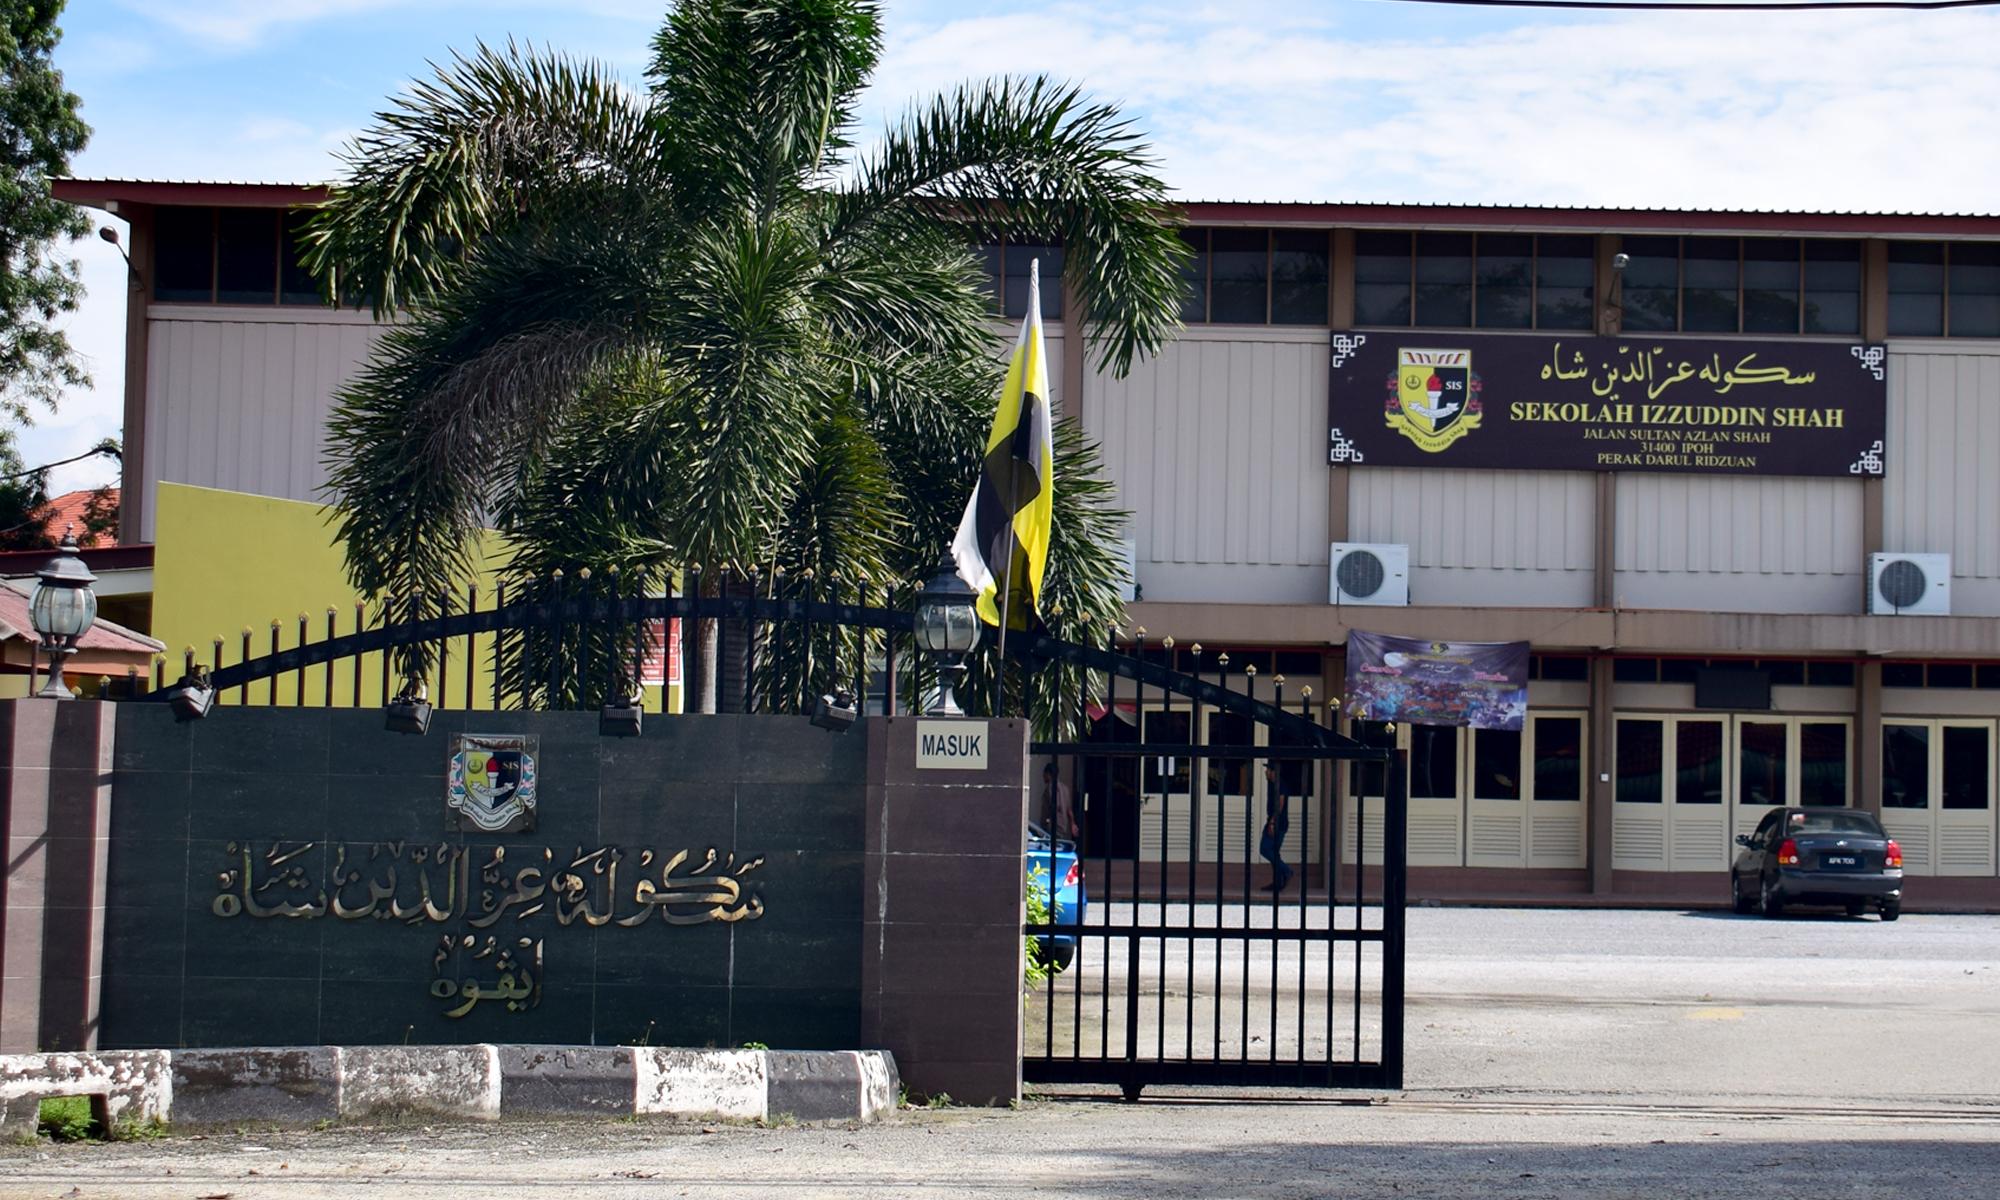 Sekolah Izzuddin Shah, Ipoh